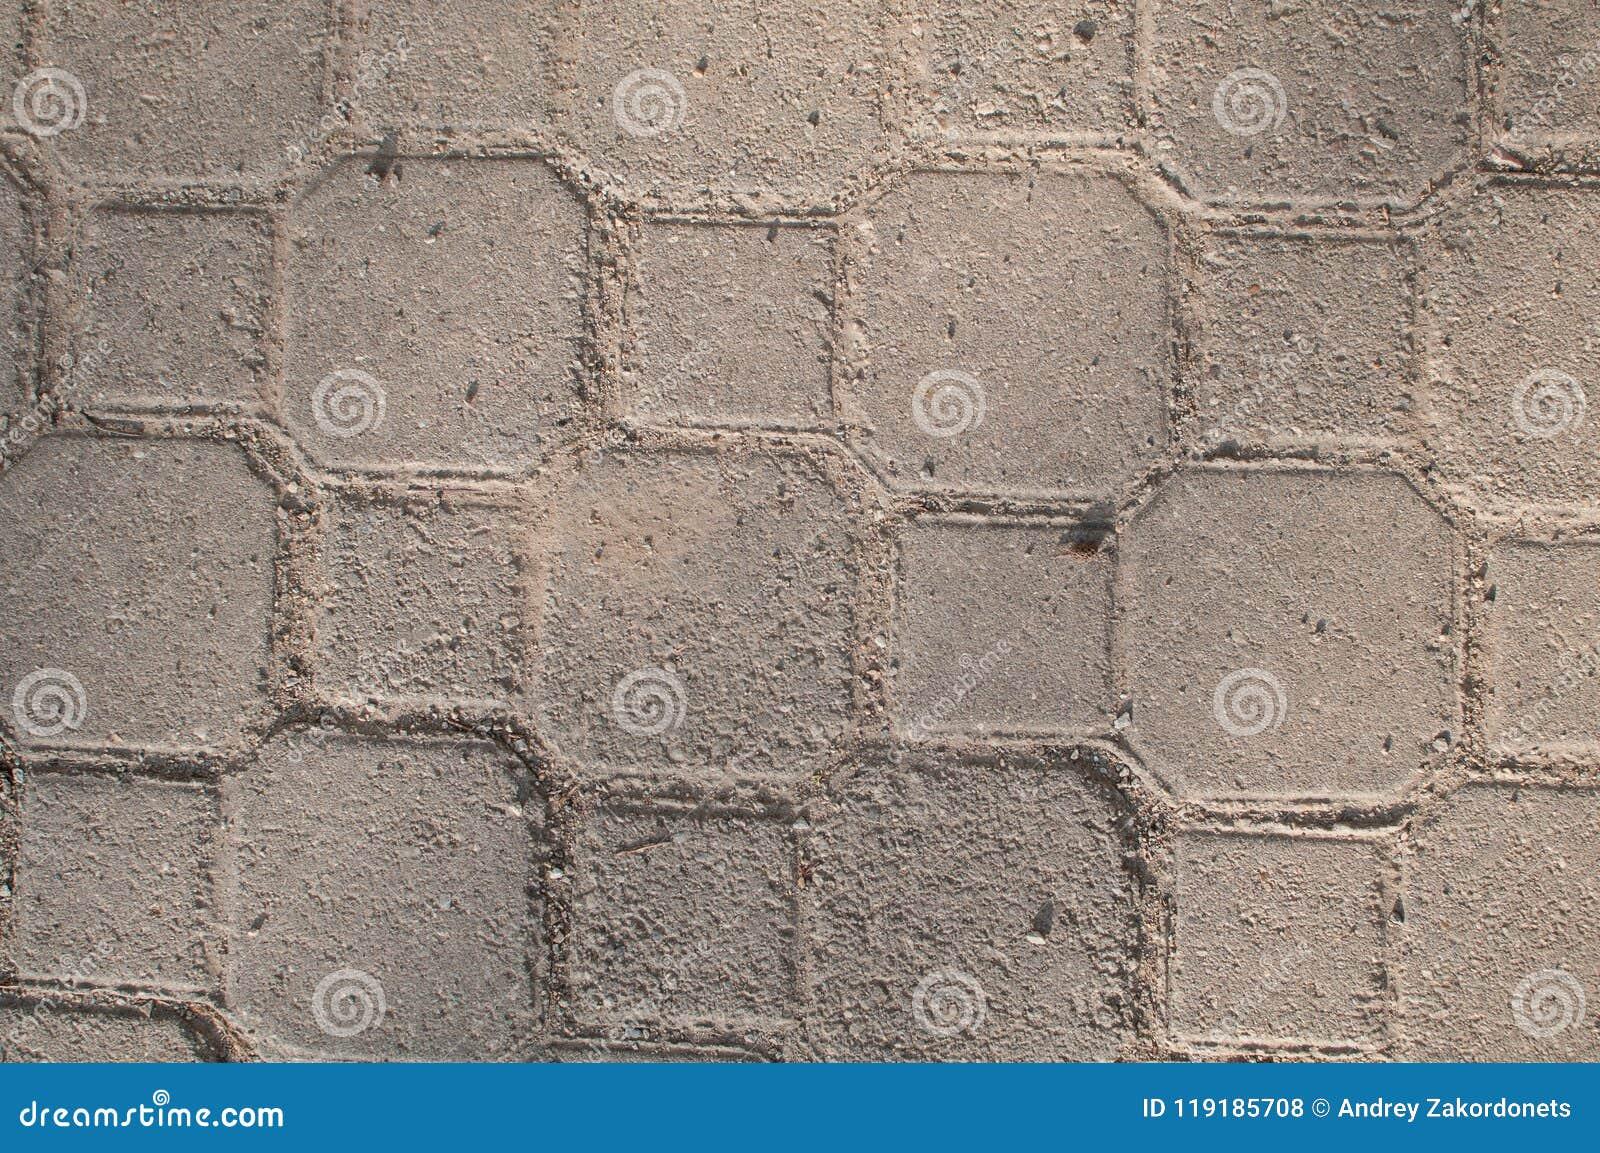 Sidewalk texture seamless Rough Gray Paving Slabs Sidewalk Coverage Seamless Tileable Texture Dreamstimecom Gray Paving Slabs Sidewalk Coverage Seamless Tileable Texture